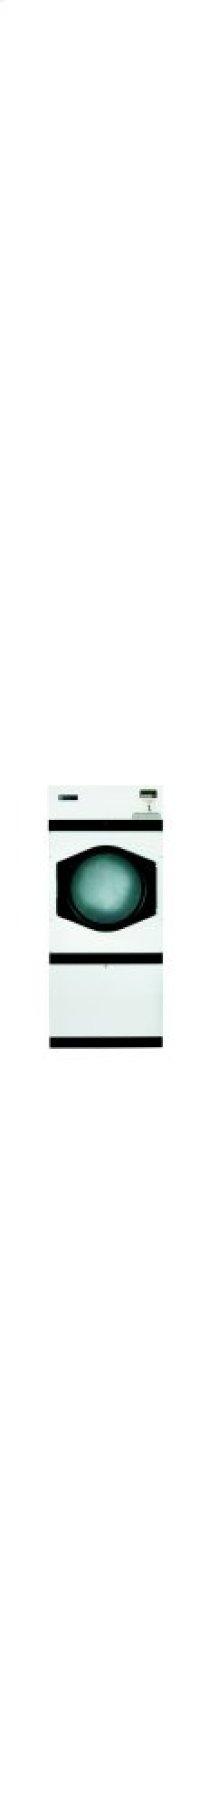 Commercial Multi-Load Dryer